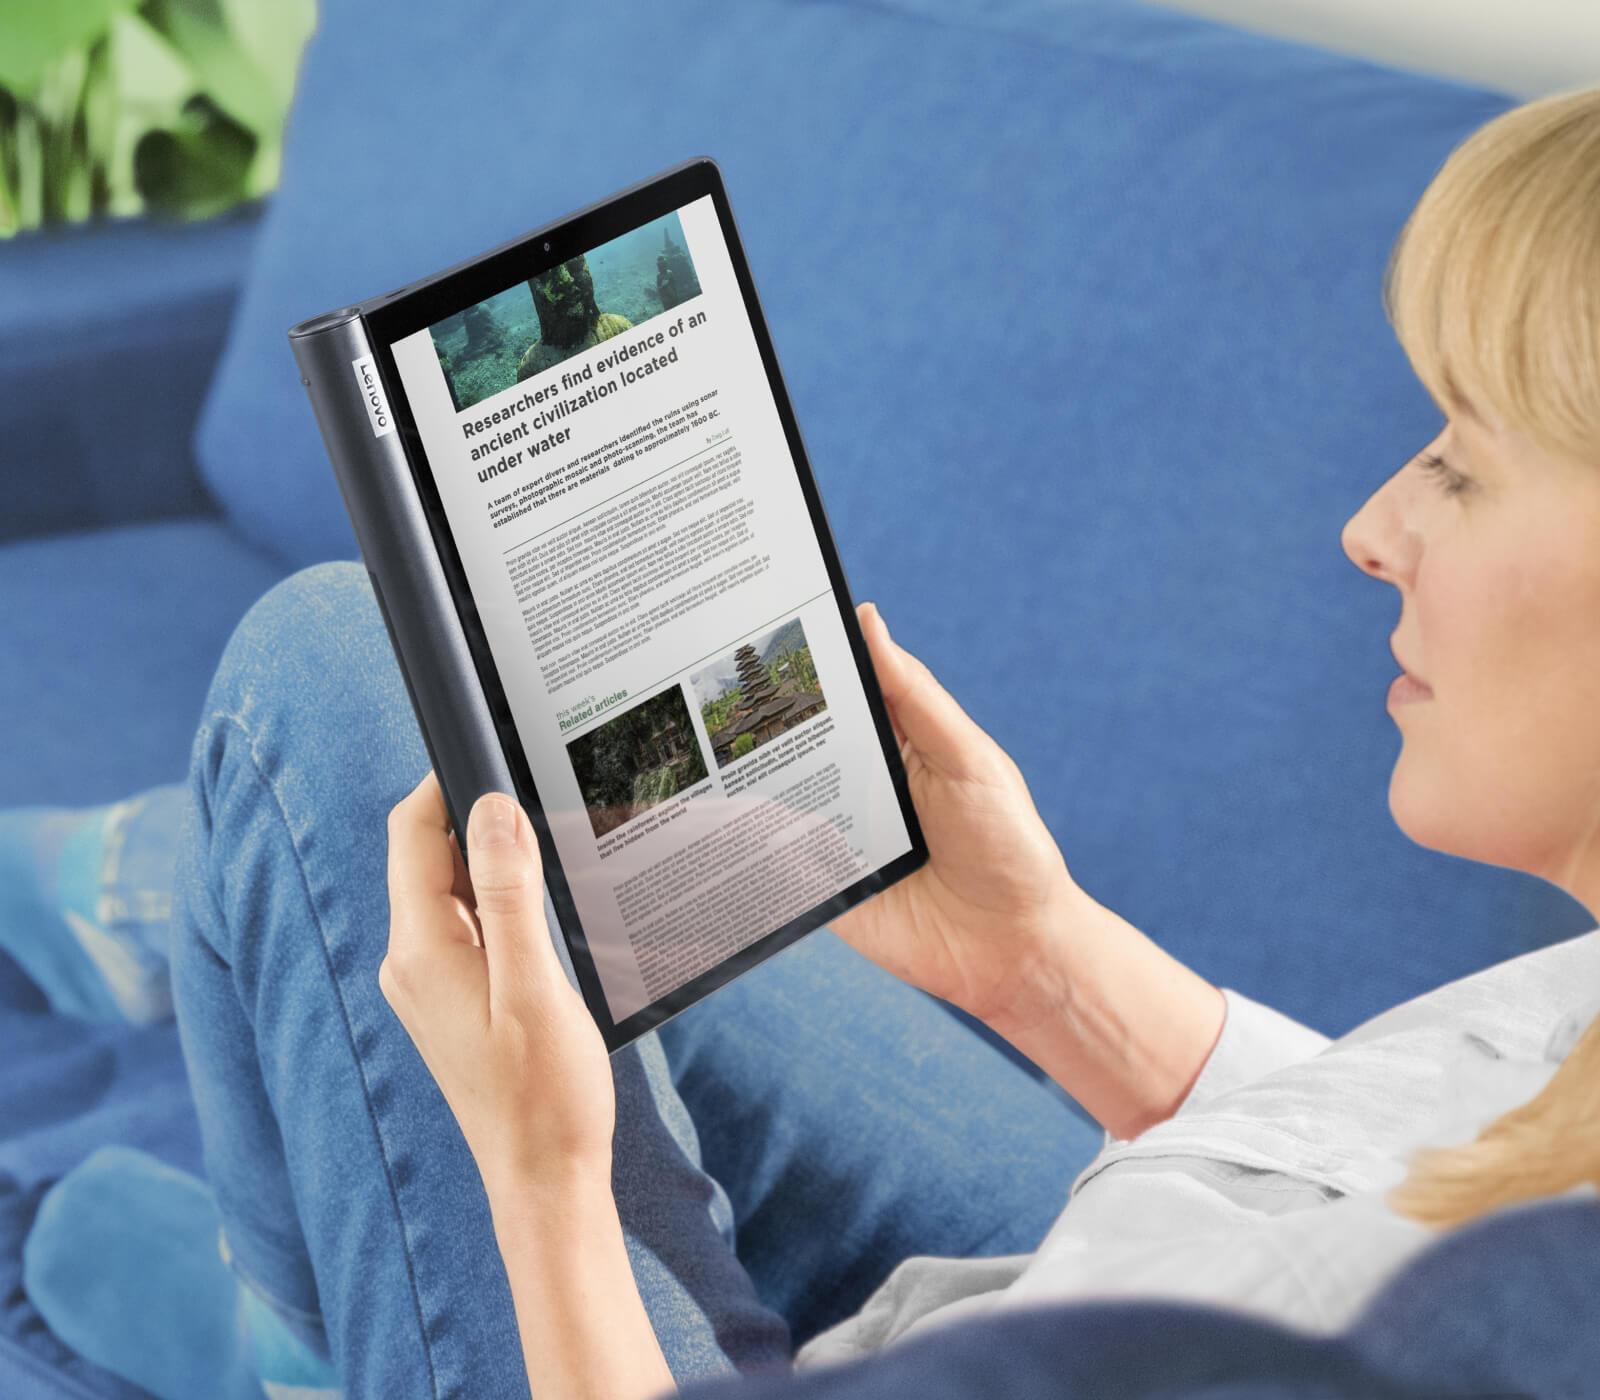 Online dating industrien inntekter 2014